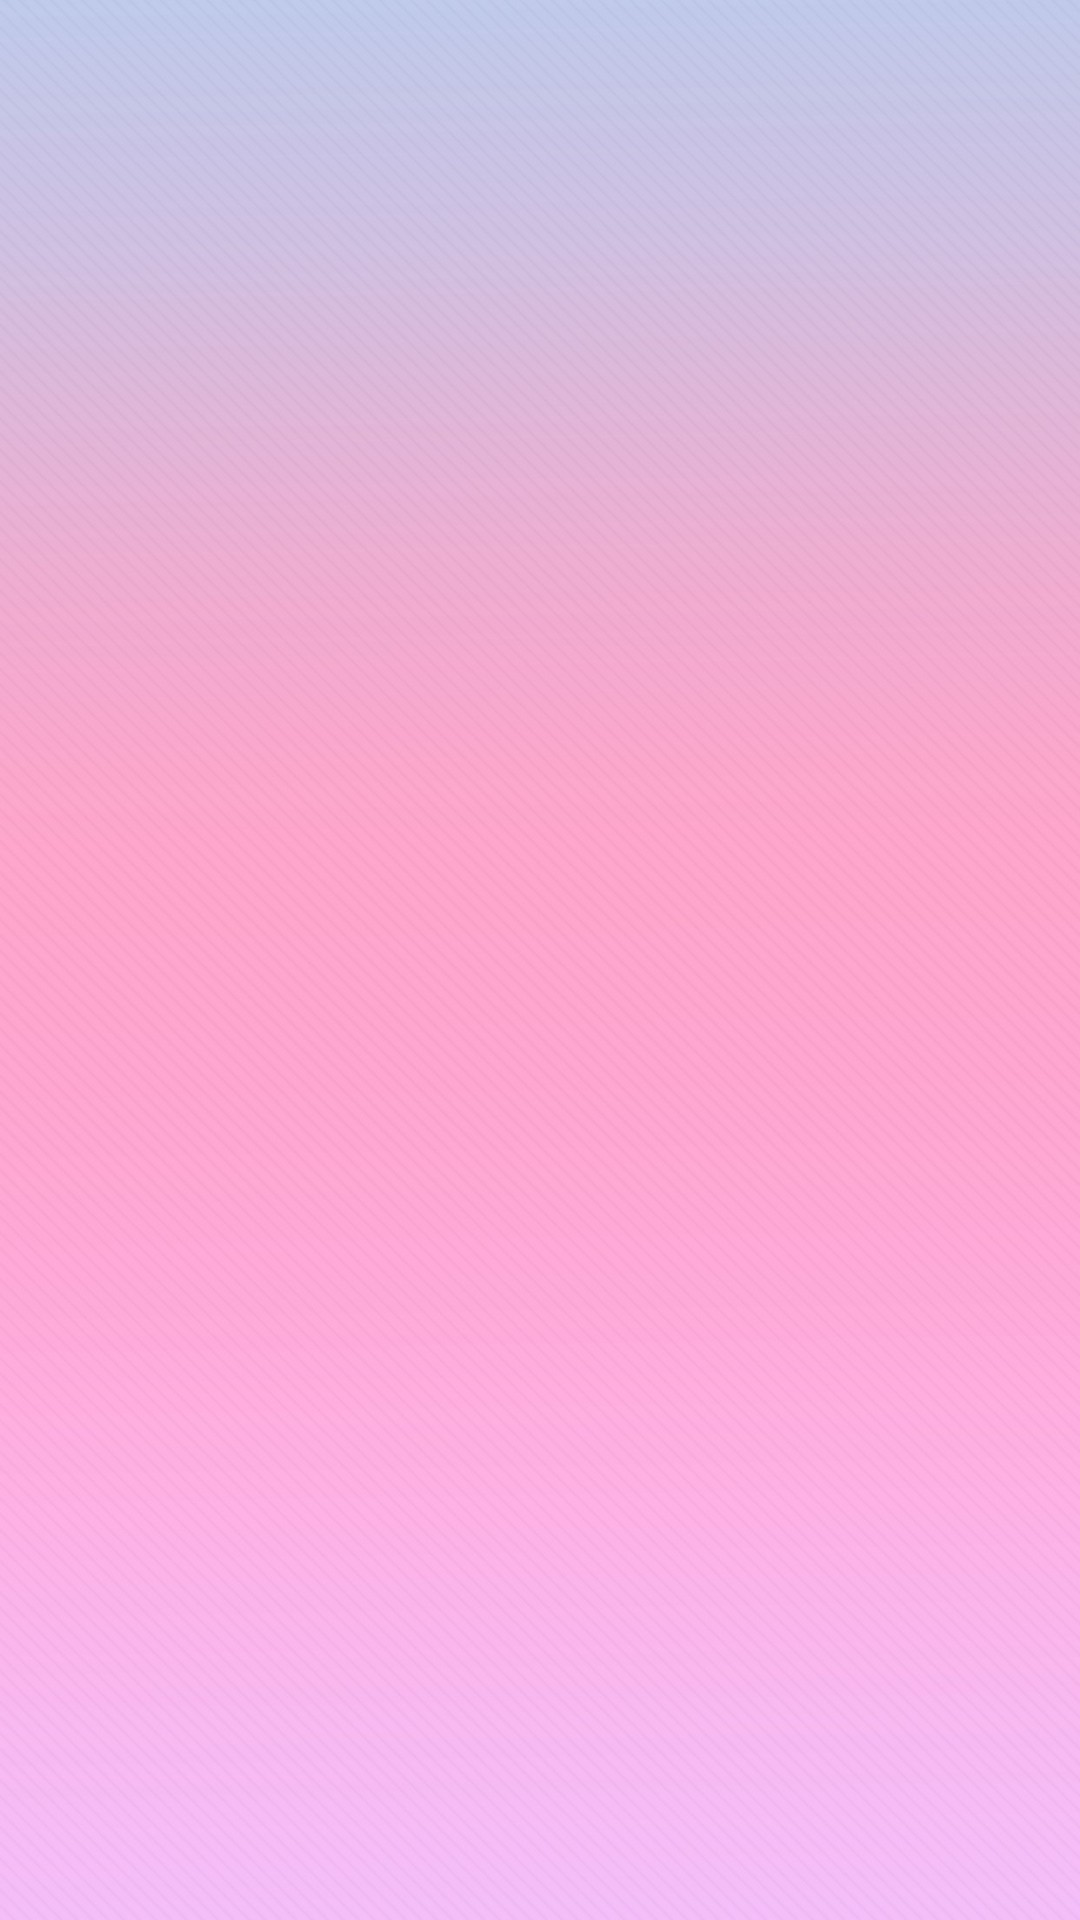 Rose Gold Wallpaper Iphone Xr Cute